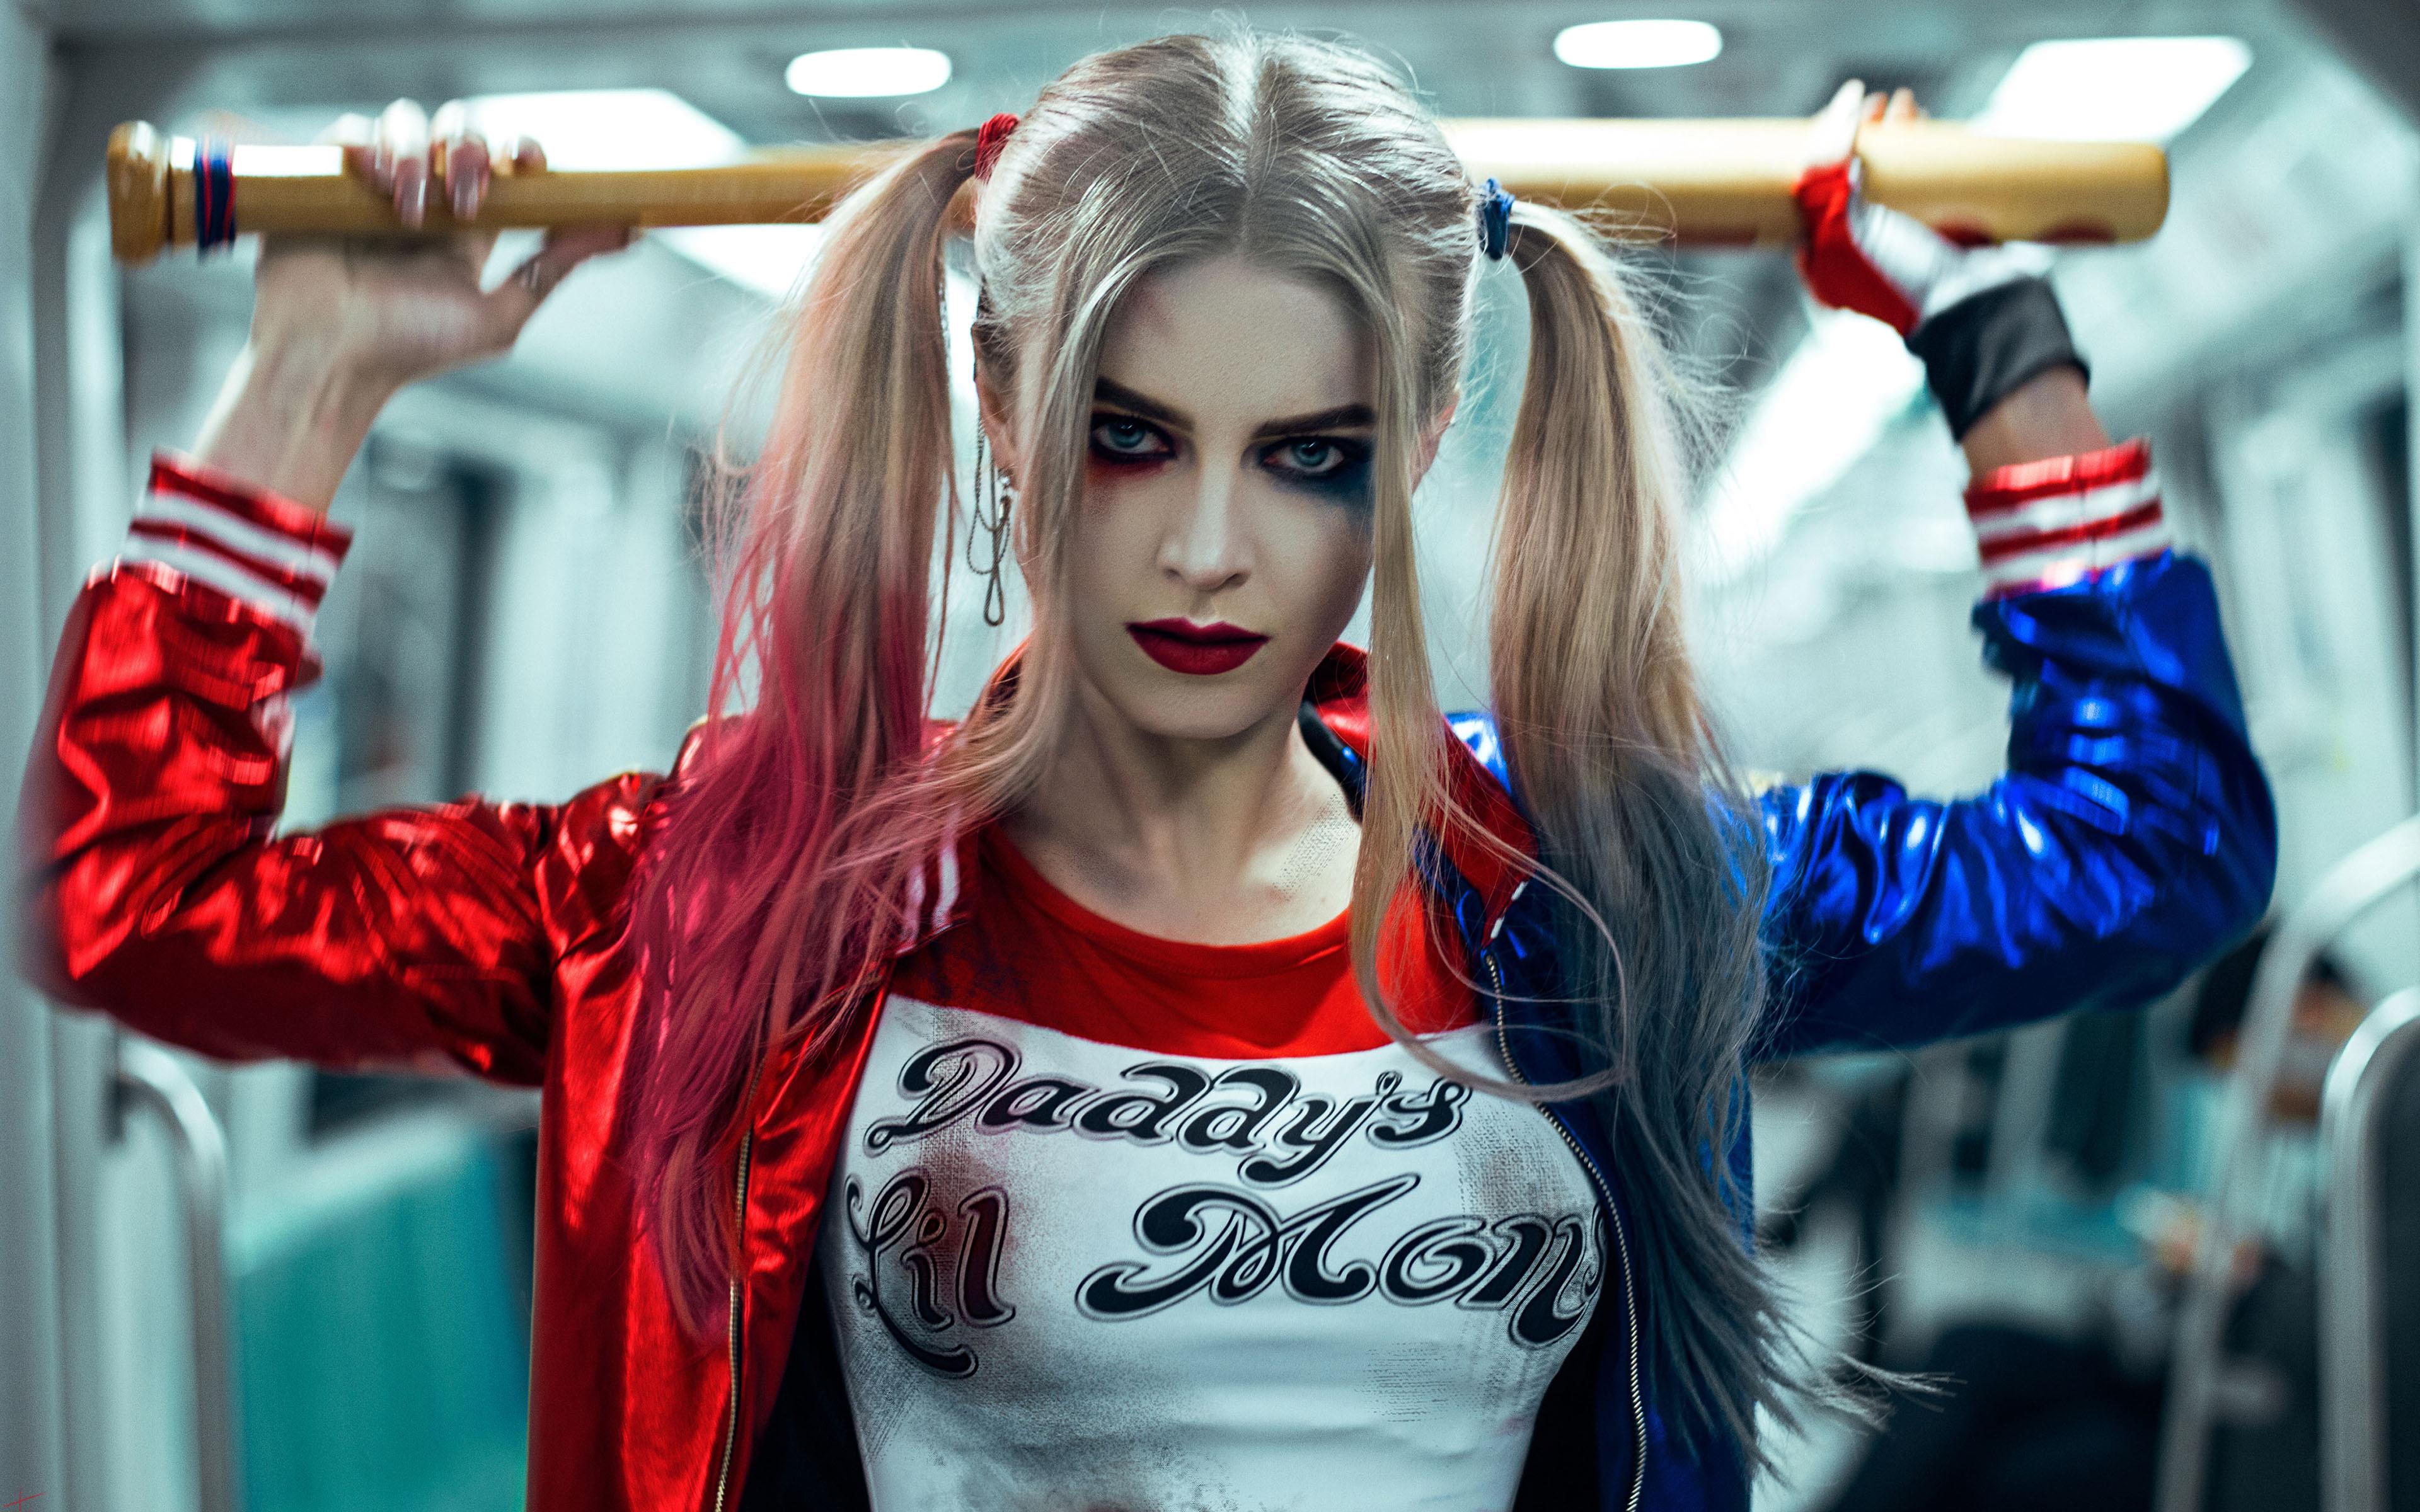 Harley quinn cosplay. обои скачать